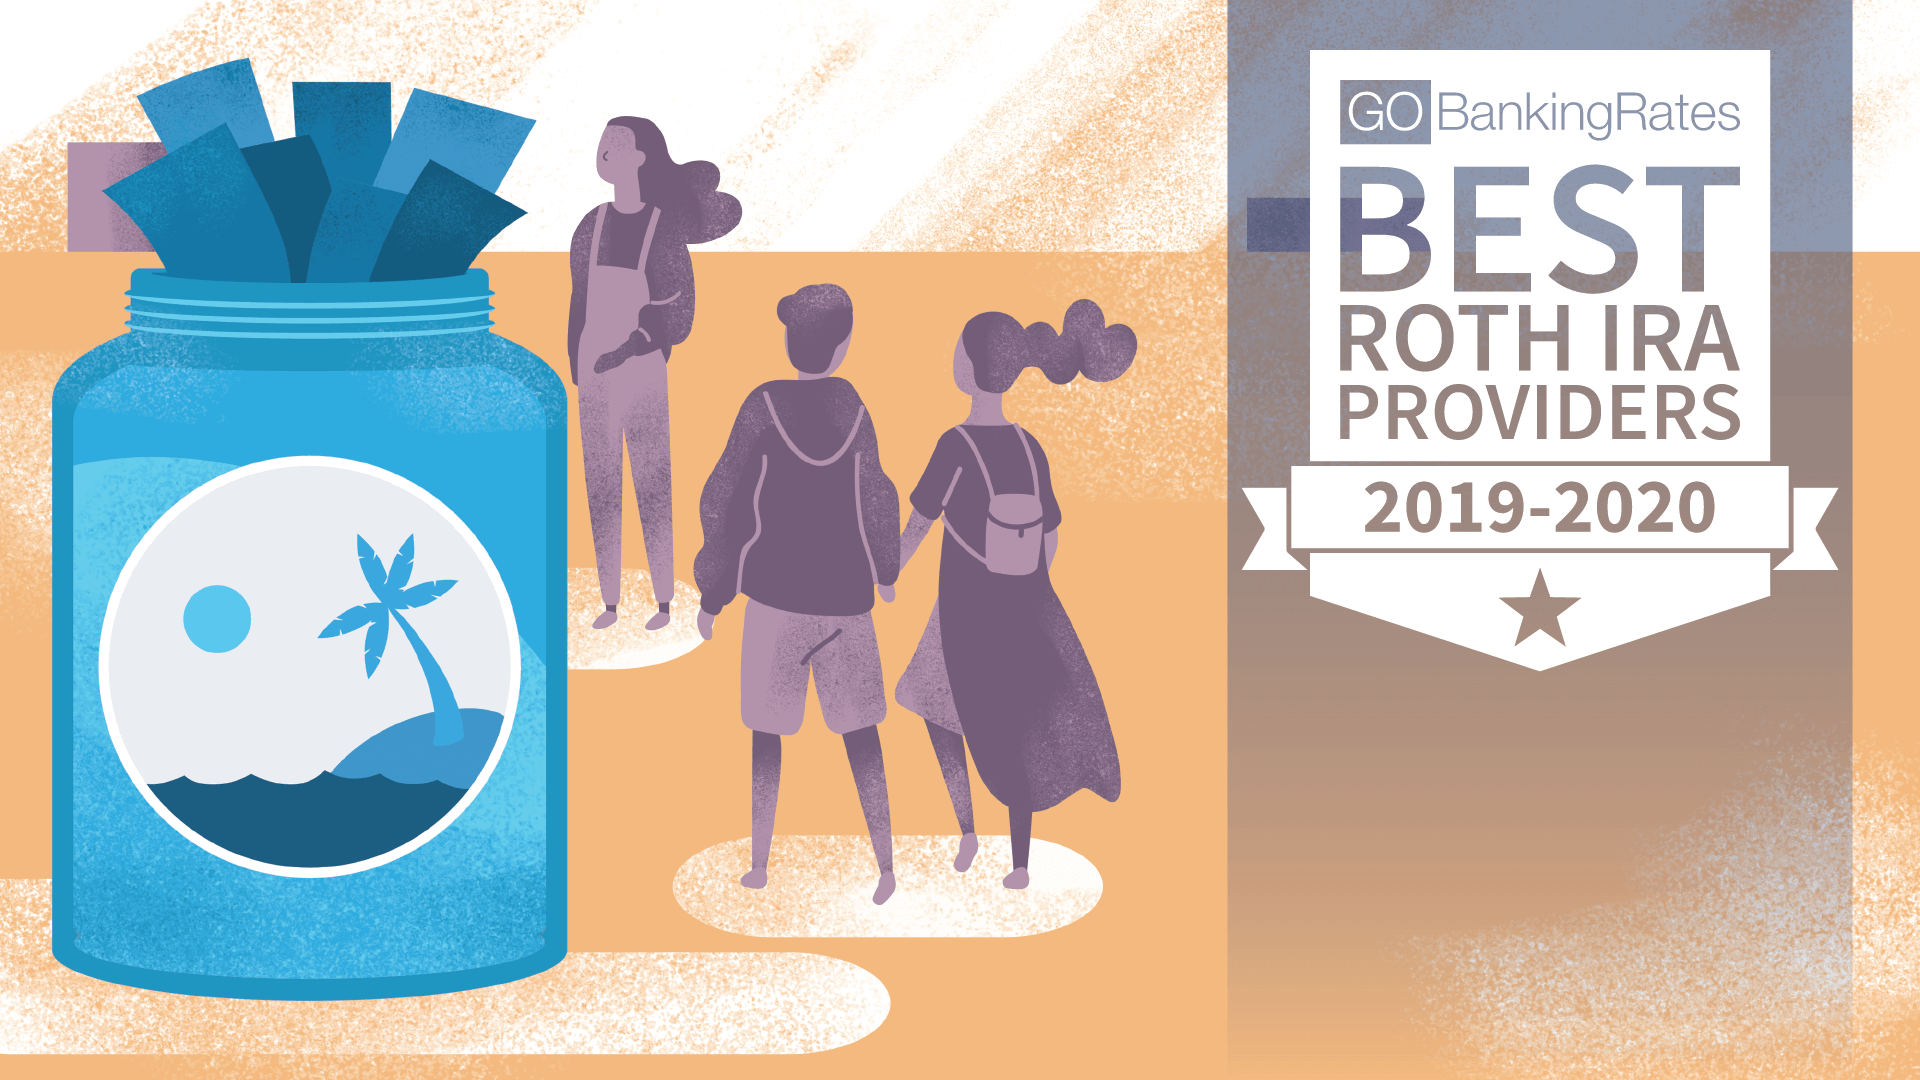 Best Roth IRA Providers 2019-2020